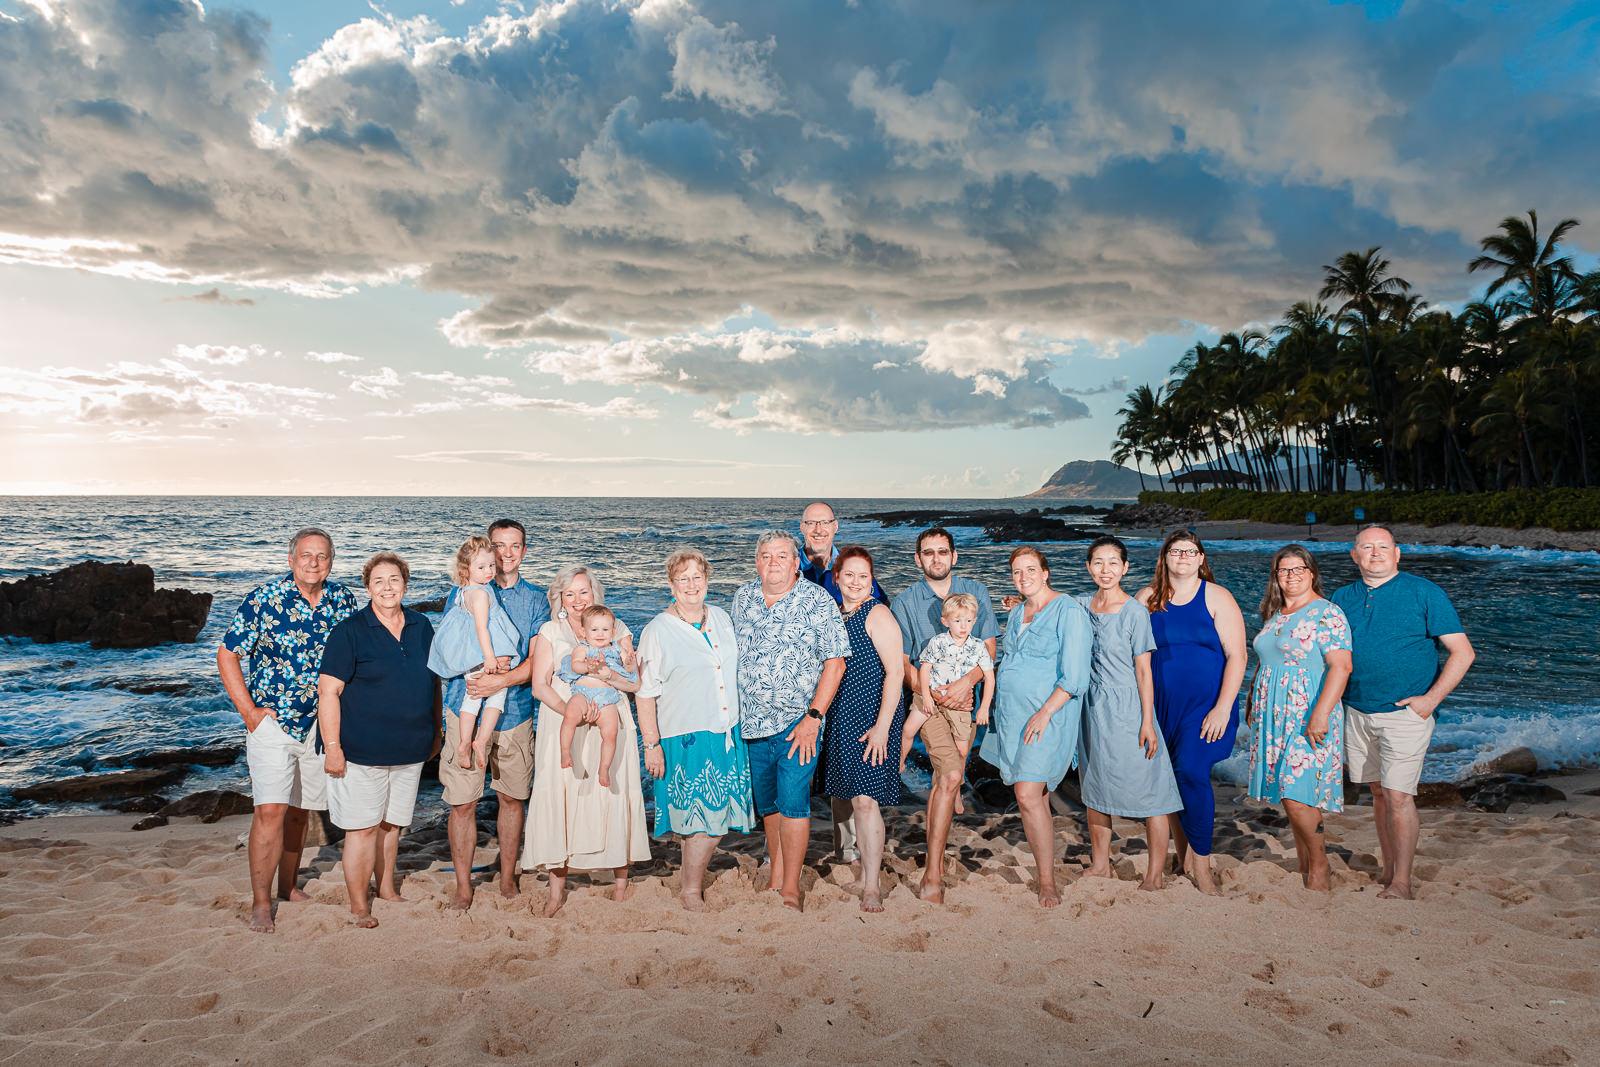 Oahu2019-9303.jpg